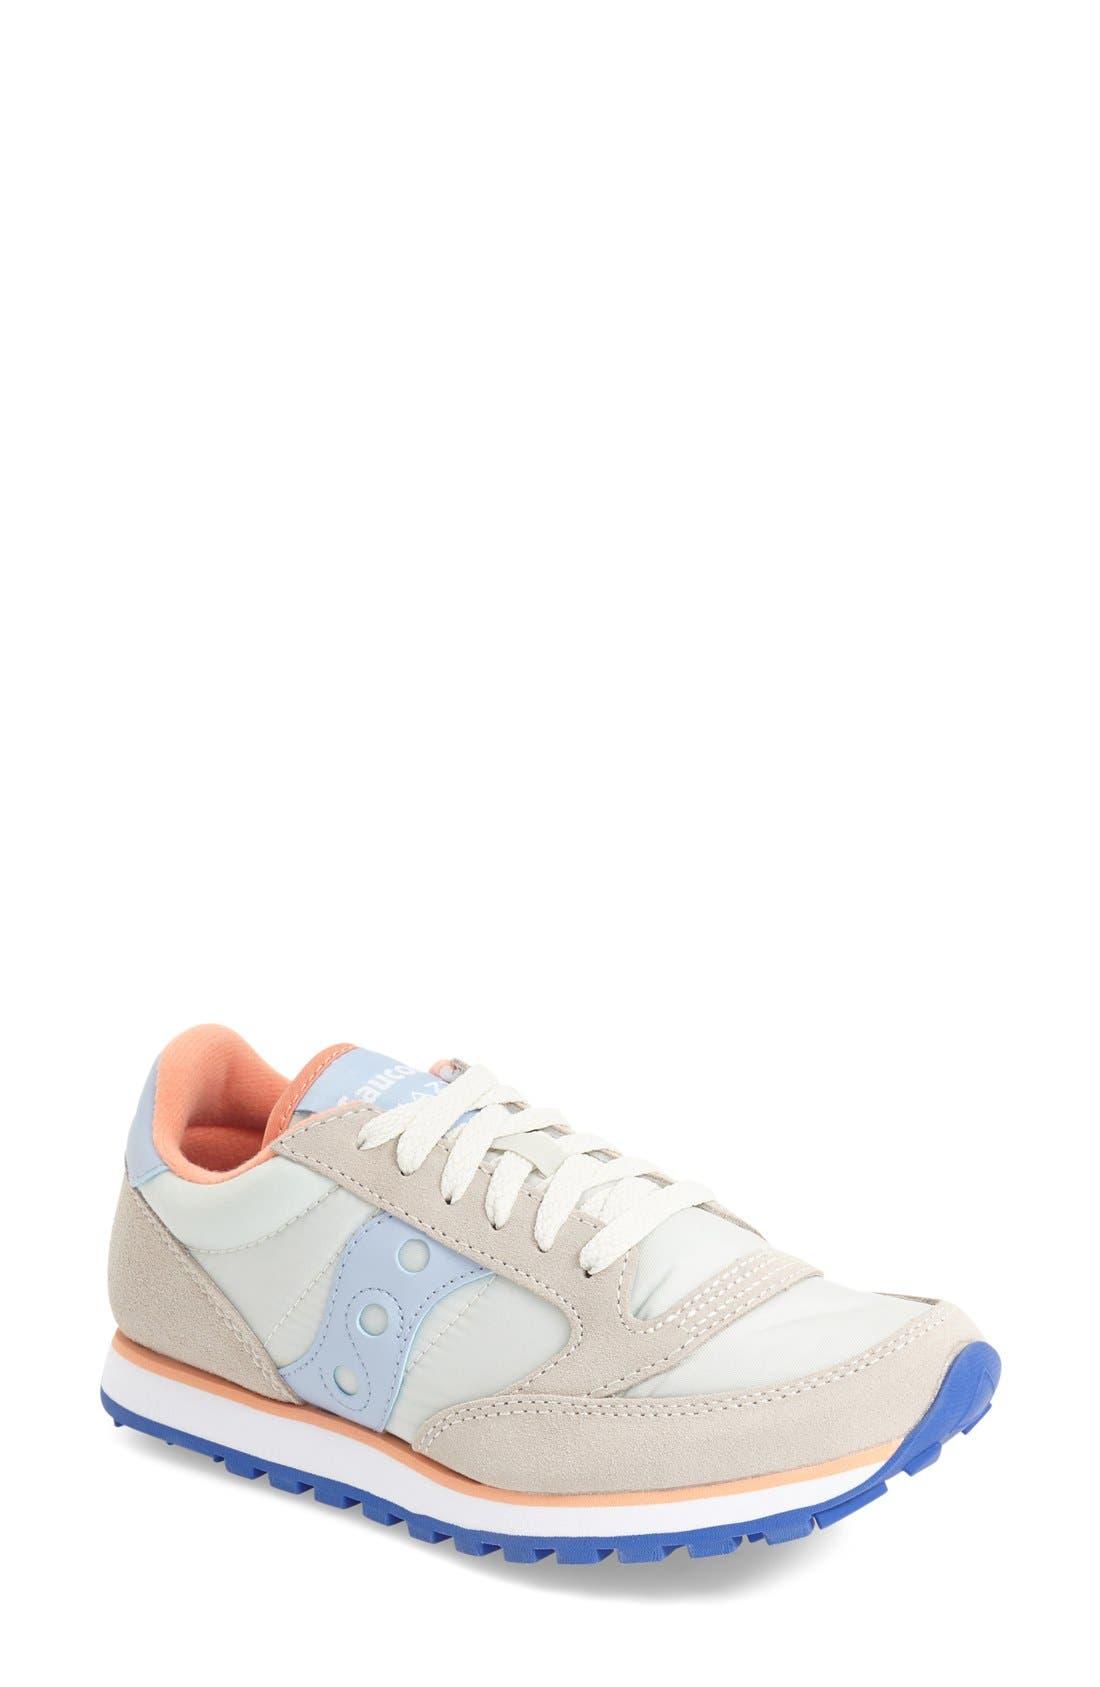 Alternate Image 1 Selected - Saucony 'Jazz - Low Pro' Sneaker (Women)